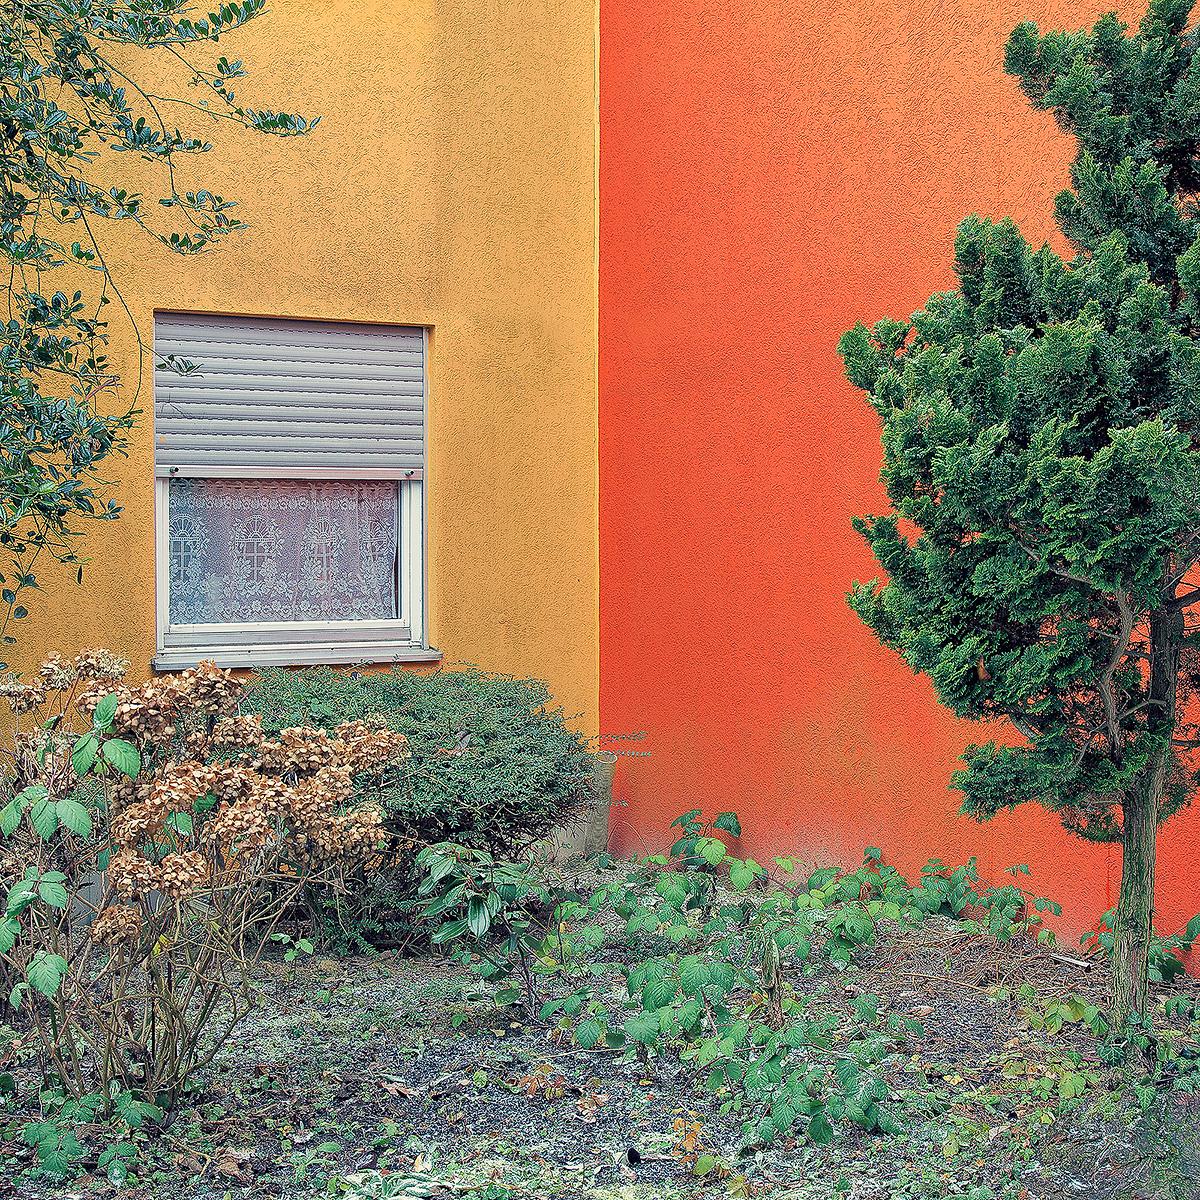 PeterBraunholz_Ecken(Corners)_Ecke10.jpg